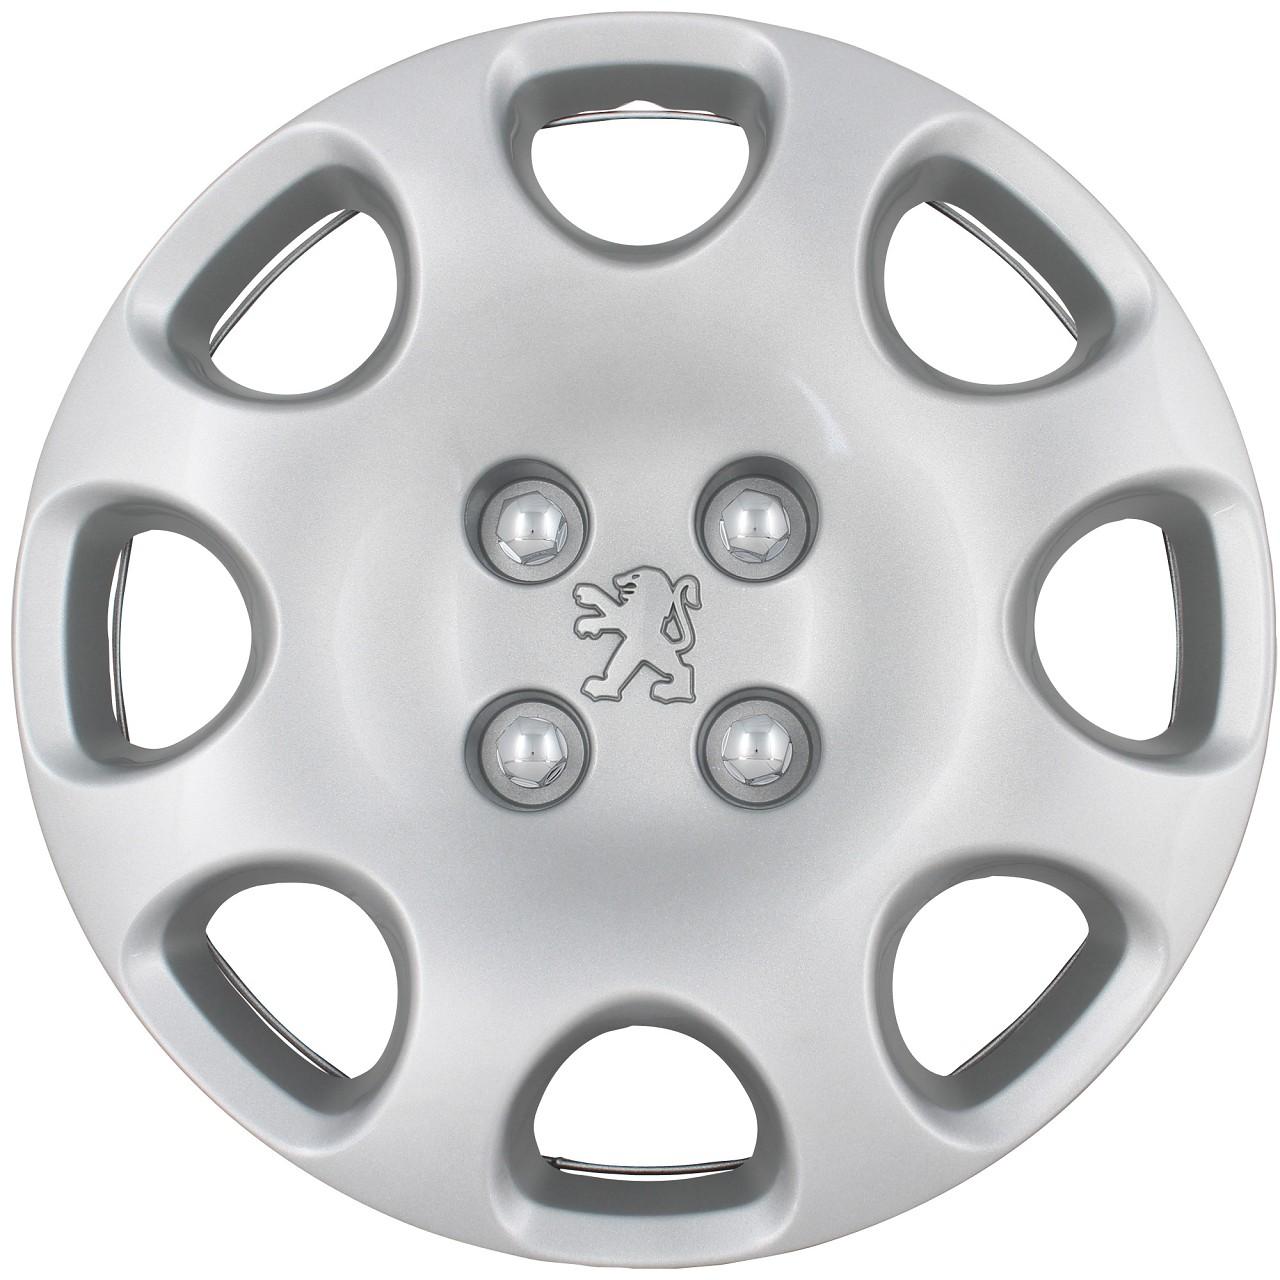 ORIGINAL Peugeot Radkappe Radblende 15 Zoll OCEANNE SILBER (1 Stück) 206 5416.F8